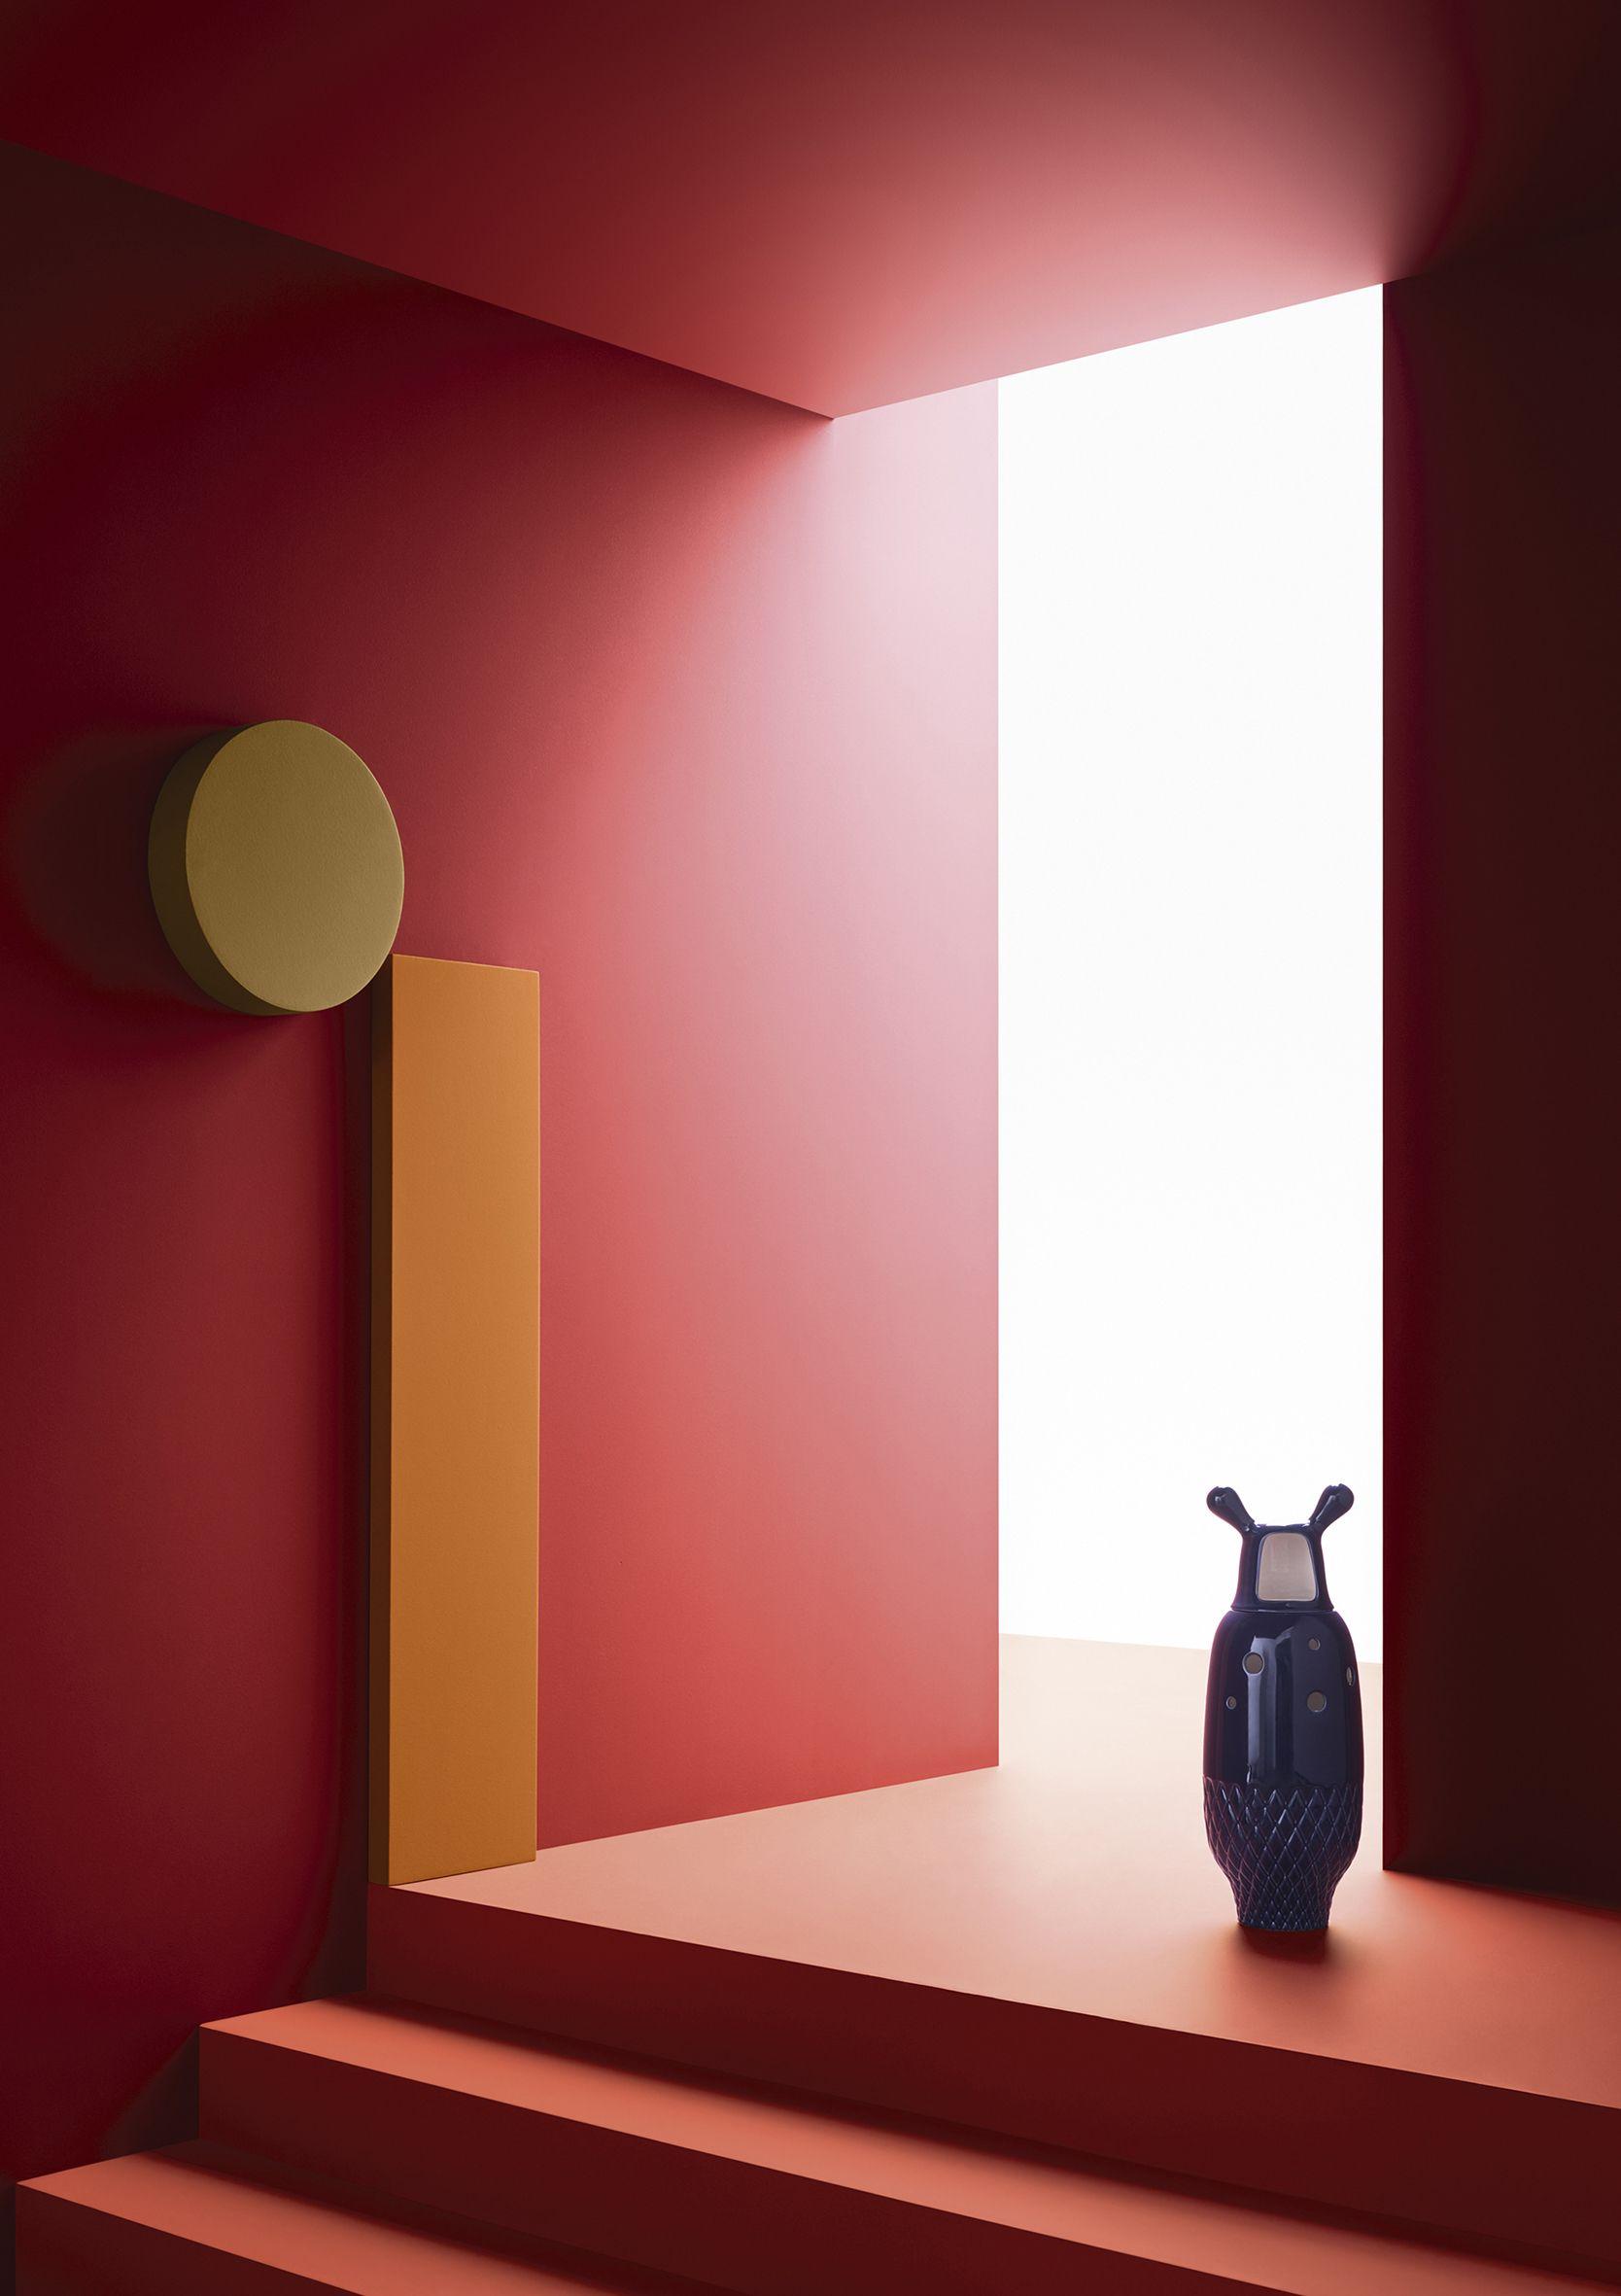 Decorative painting finish PALETTE | Blog ideas | Pinterest ...